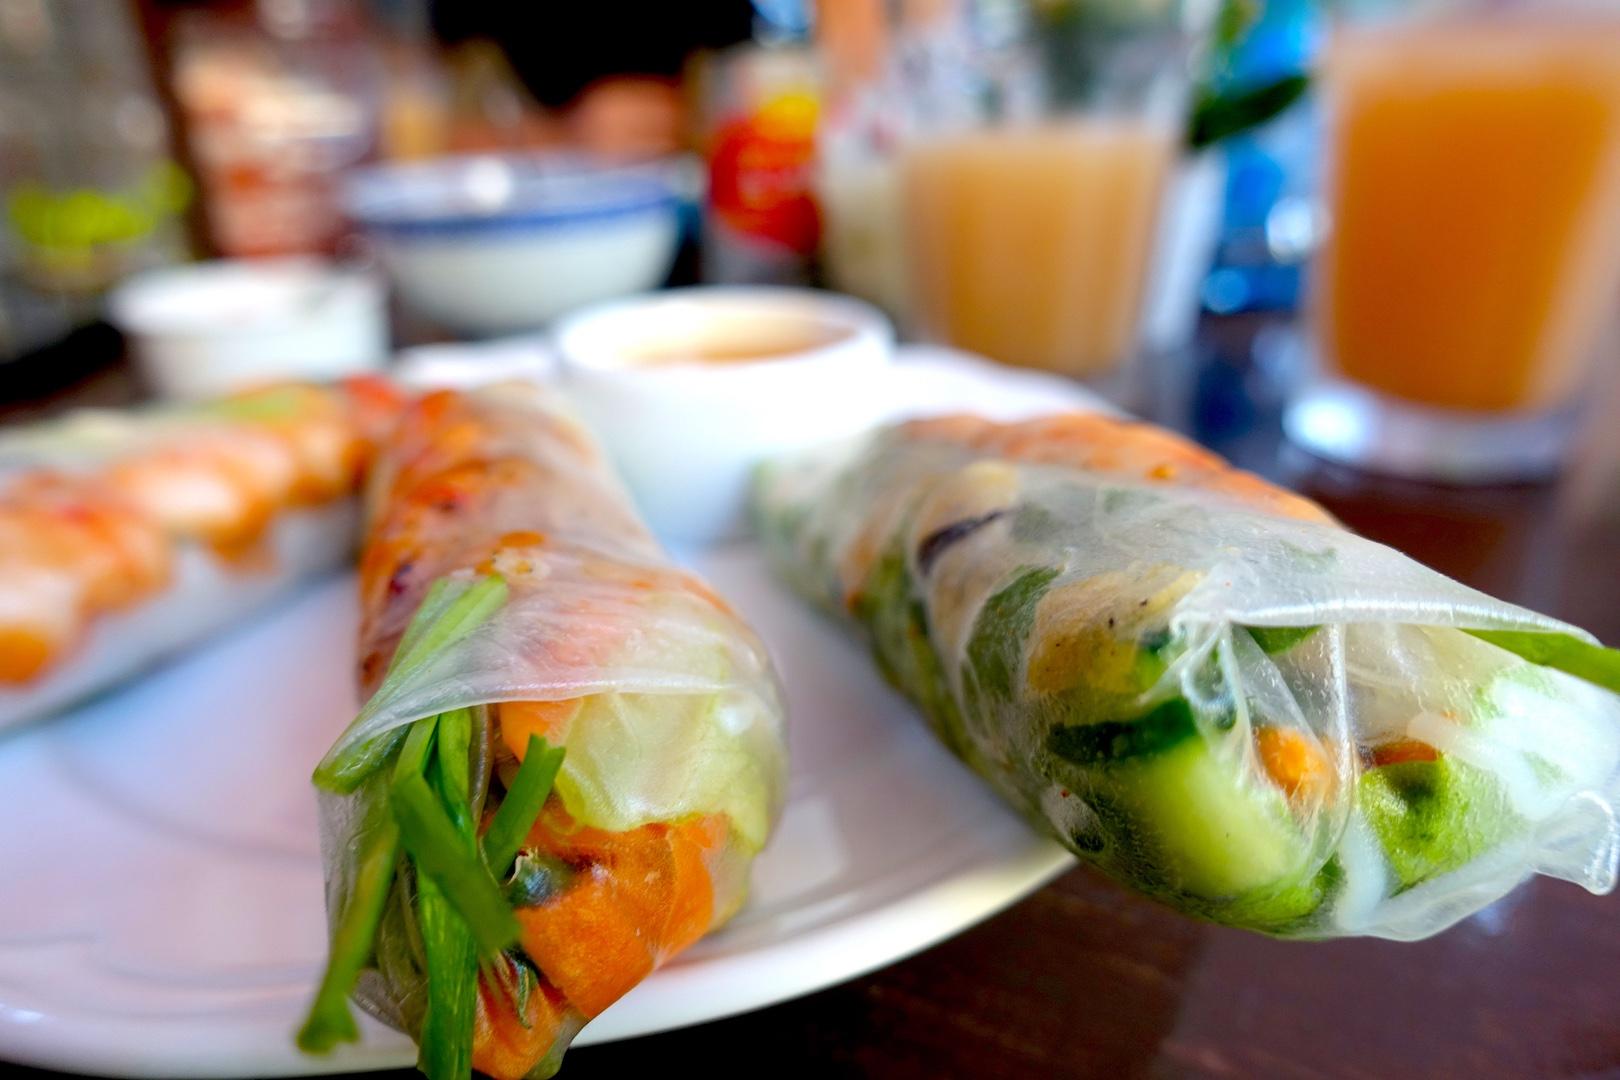 Viet Street Food Kuchnia Wietnamska Na Saskiej Kępie